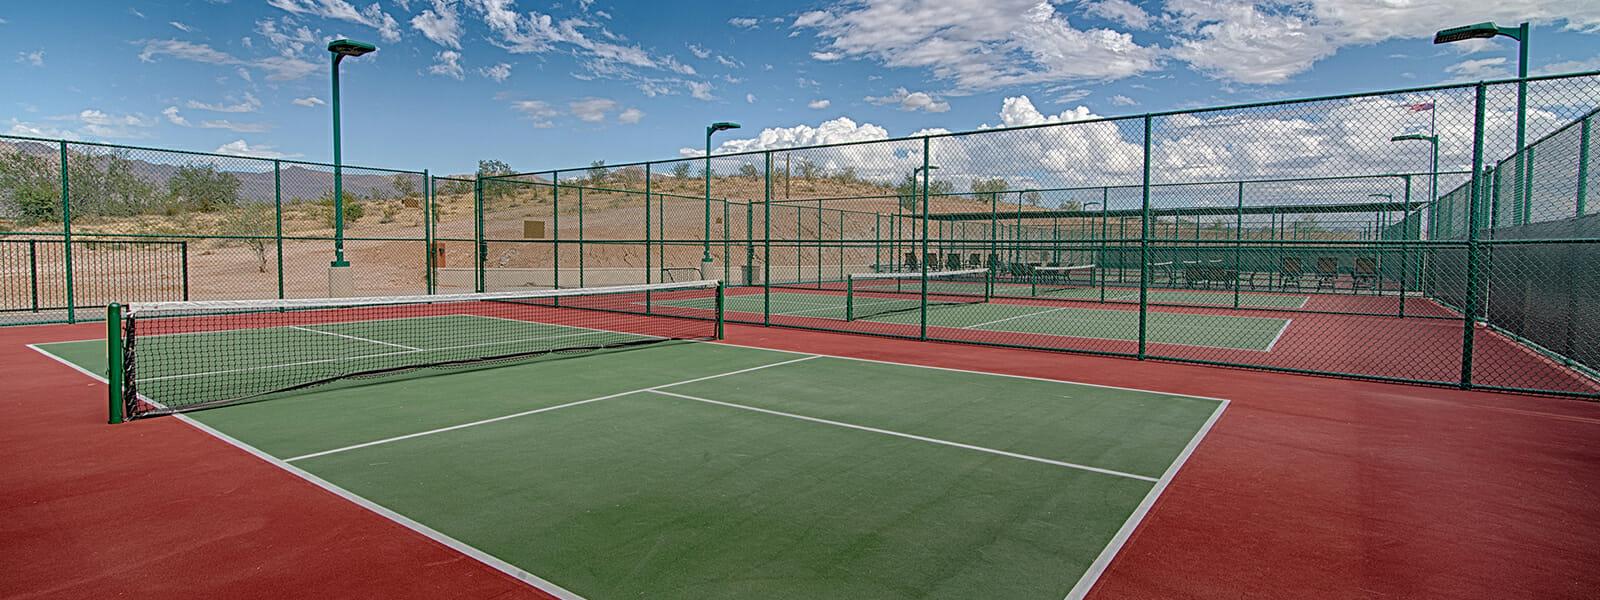 Gated Community near Phoenix AZ   Montesa at Gold Canyon   Active Life